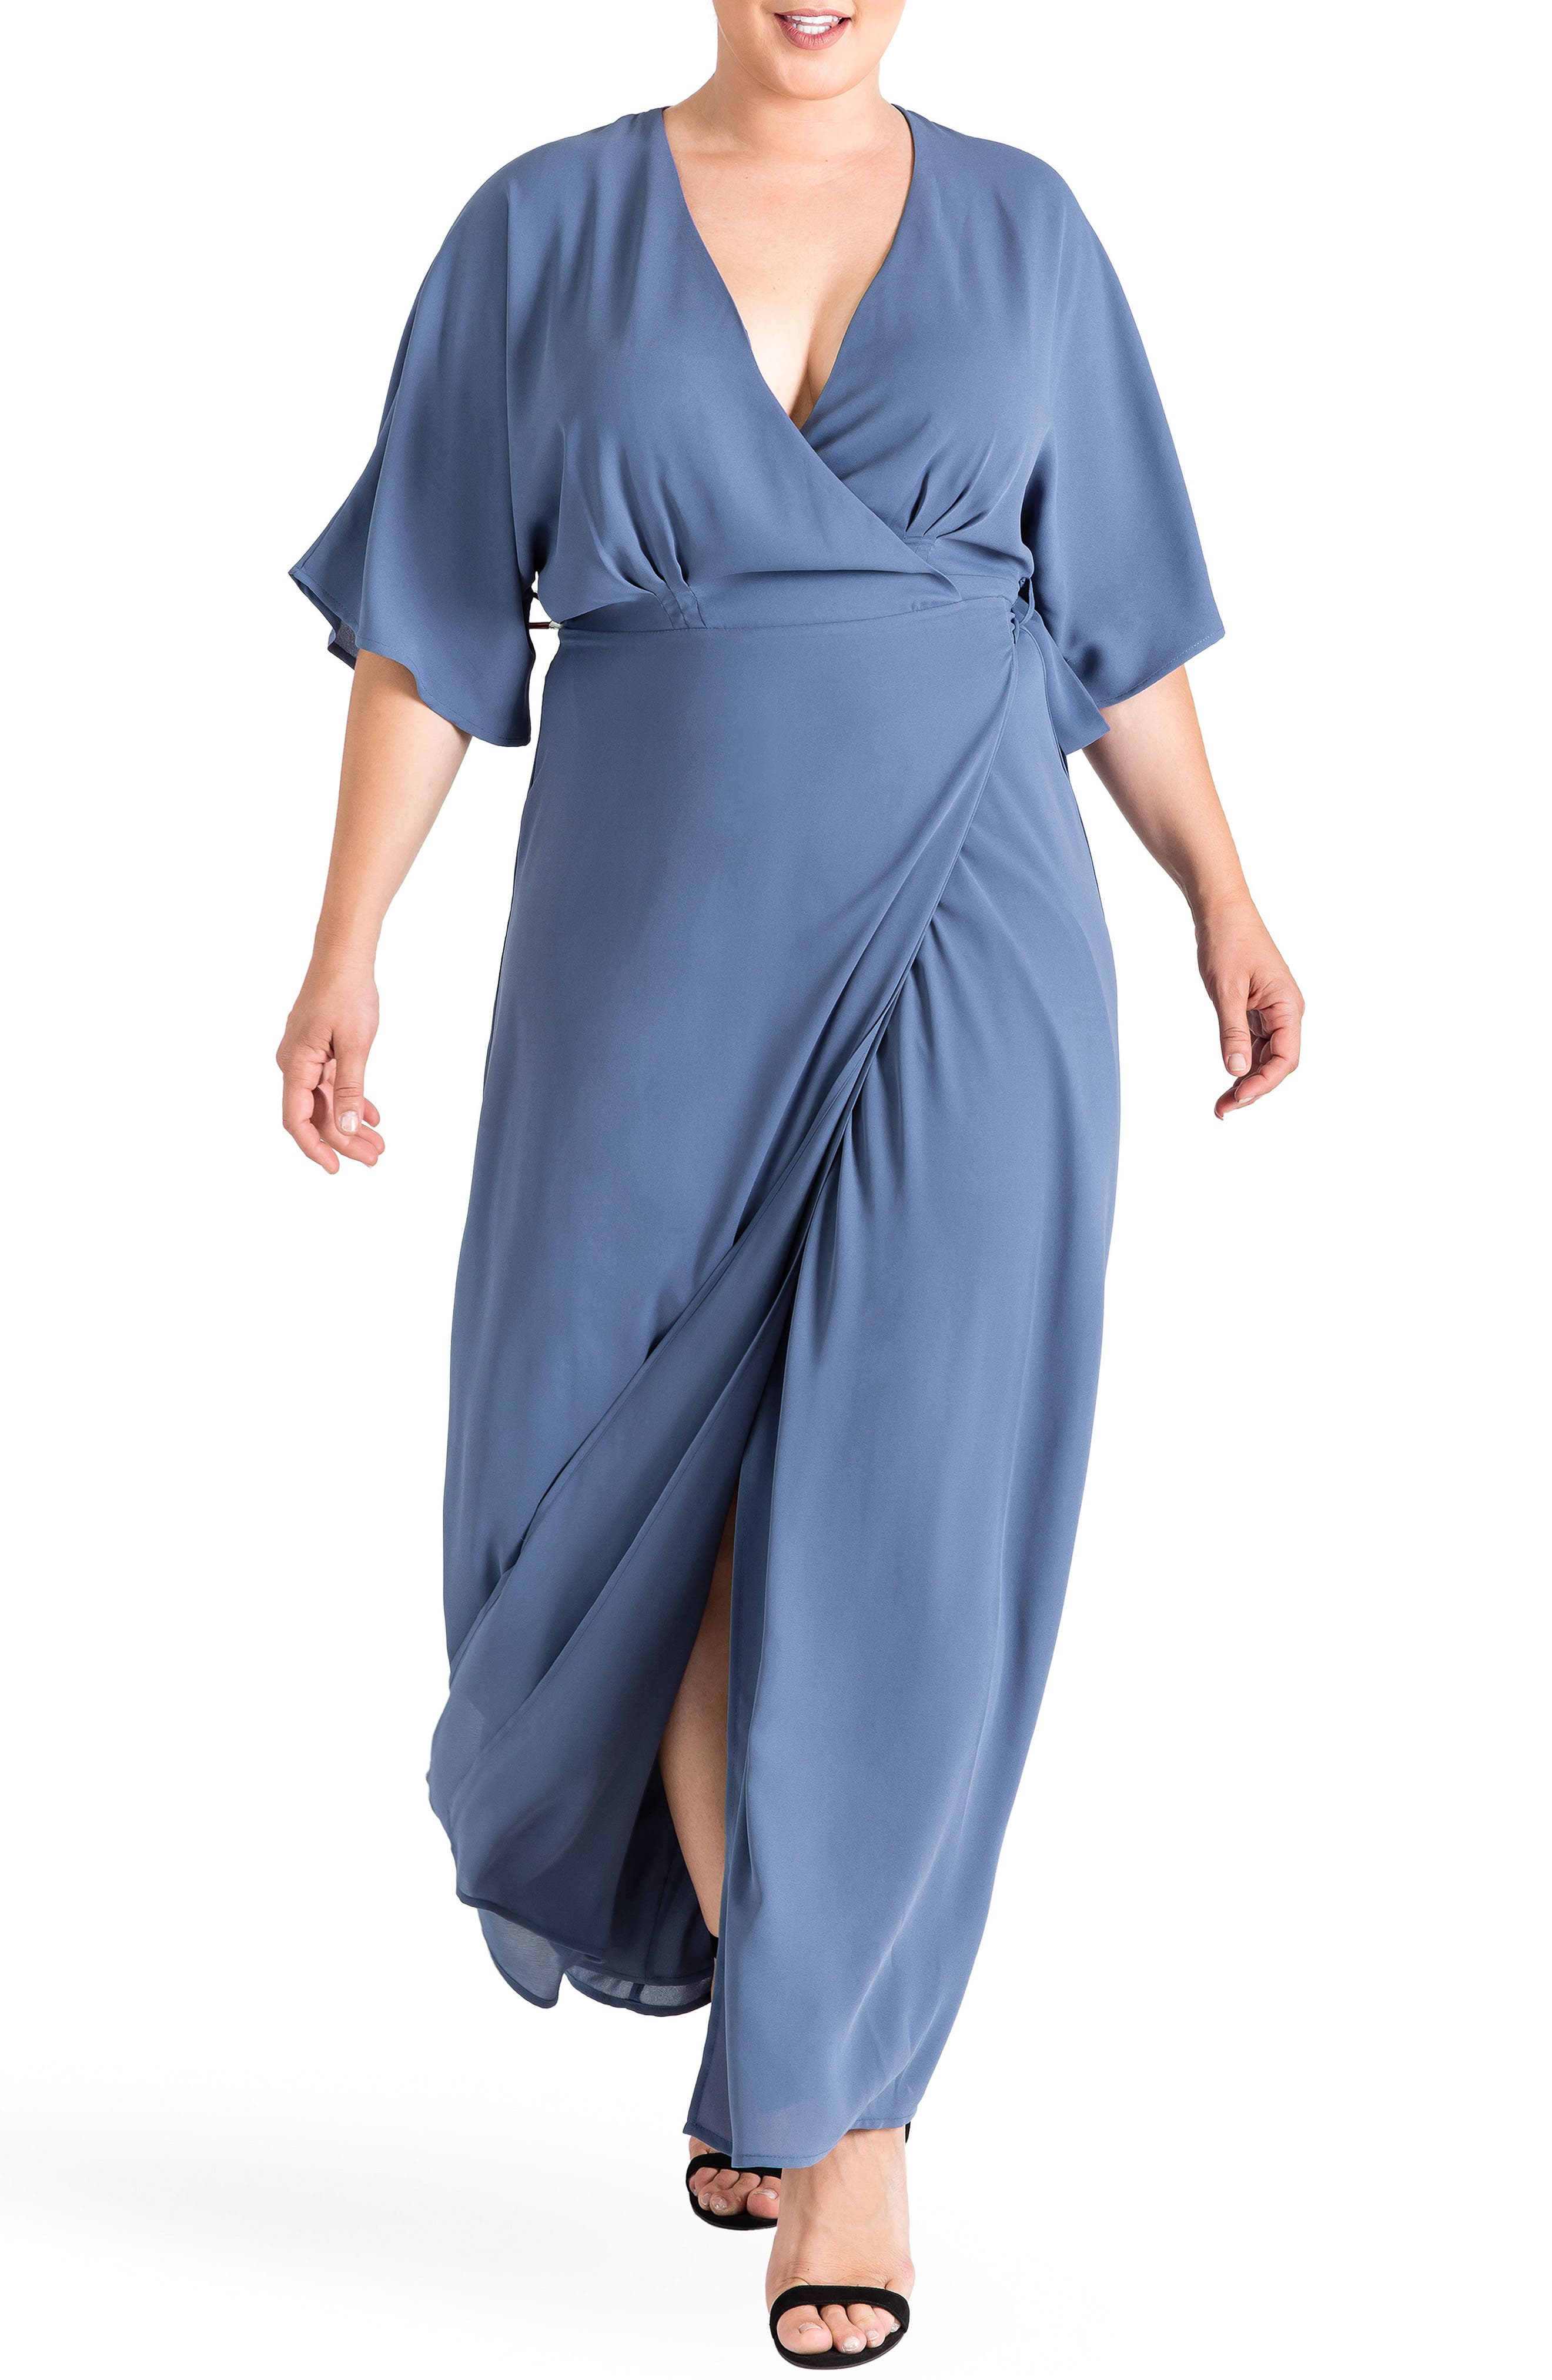 Olivia Print Wrap Maxi Dress,                             Main thumbnail 1, color,                             Slate